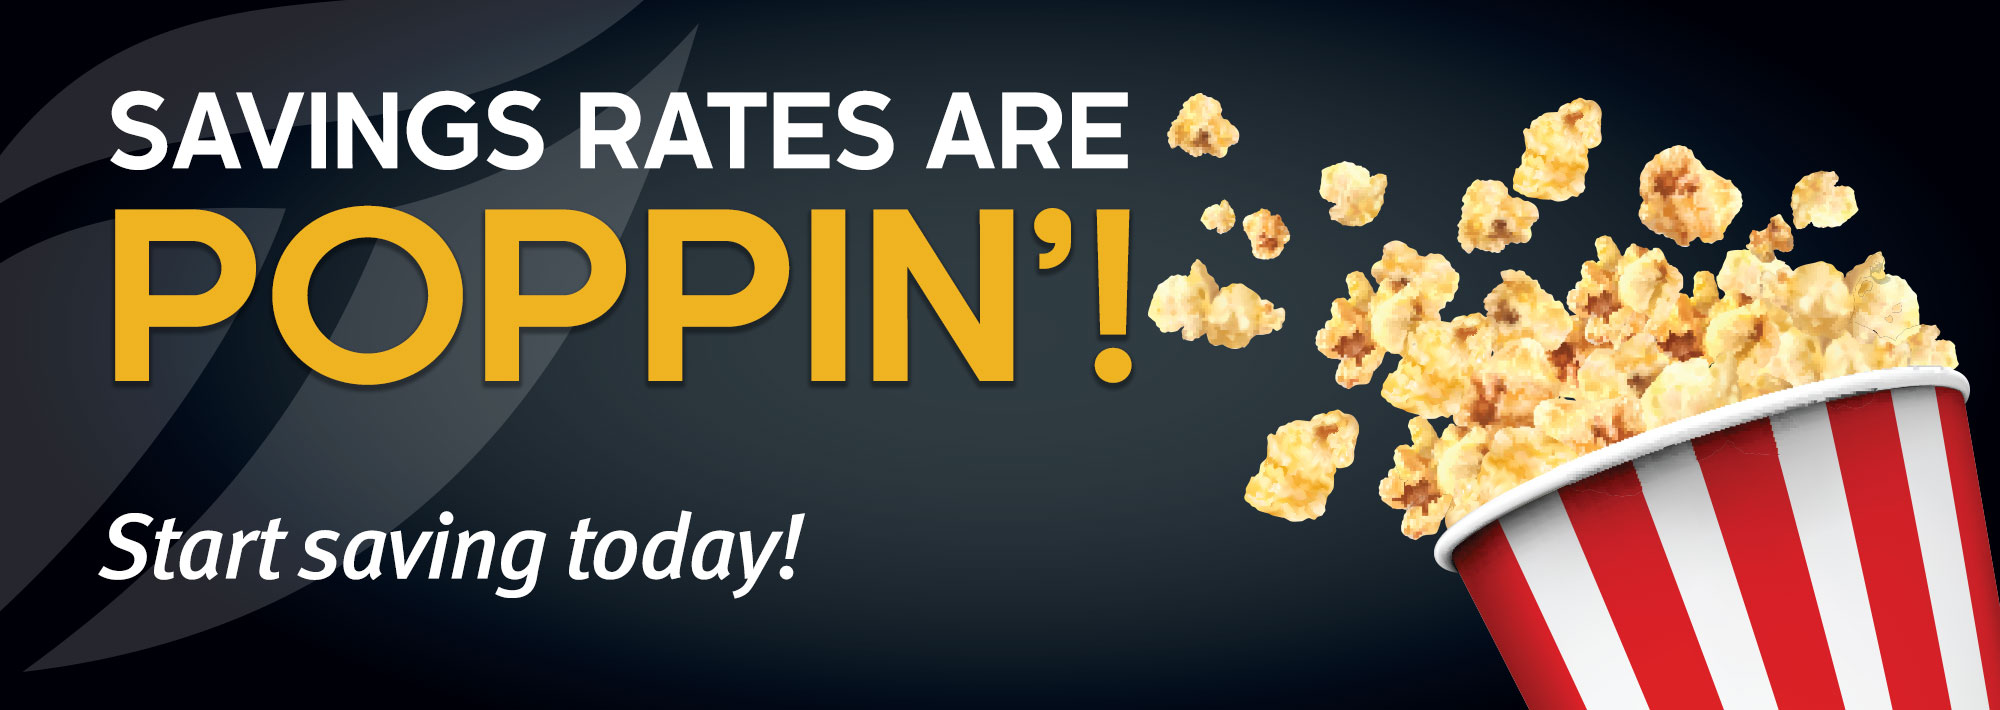 Savings Rates are poppin'! Start Saving today!